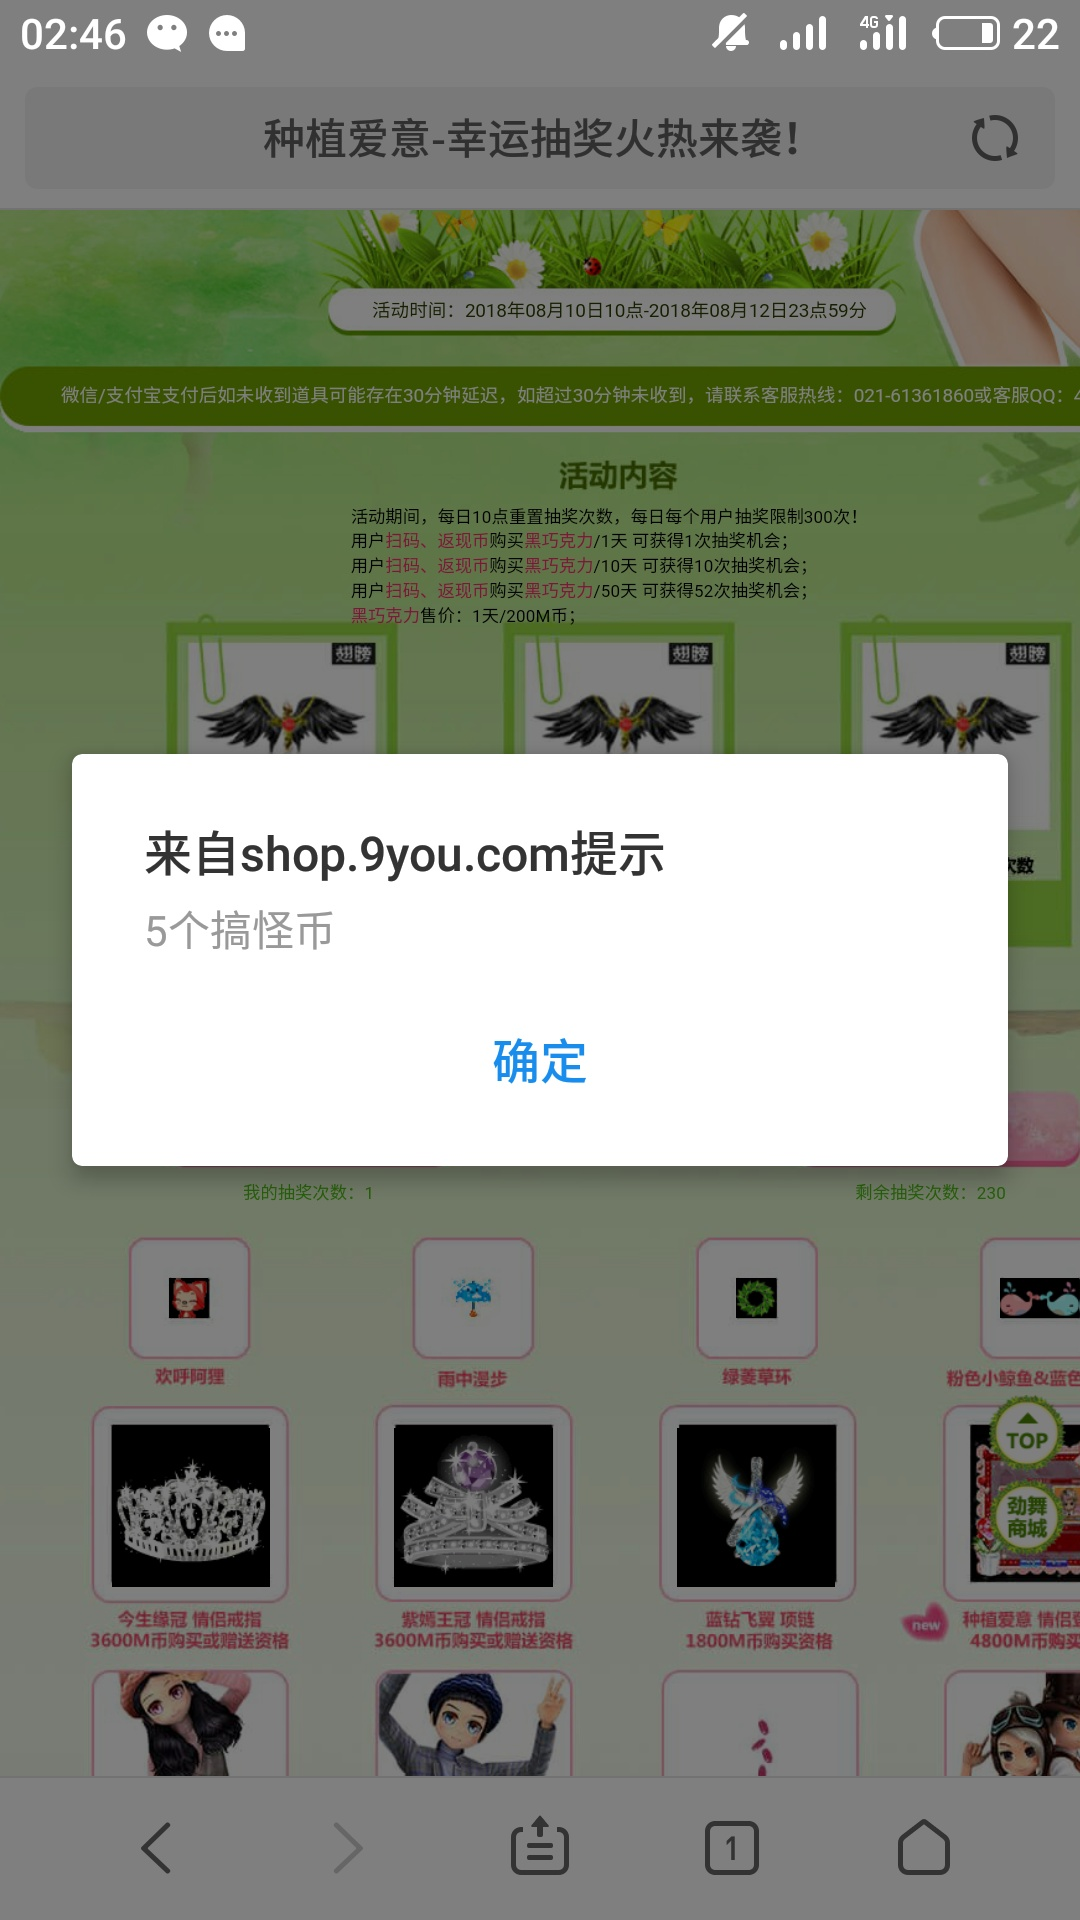 S80811-024636.jpg